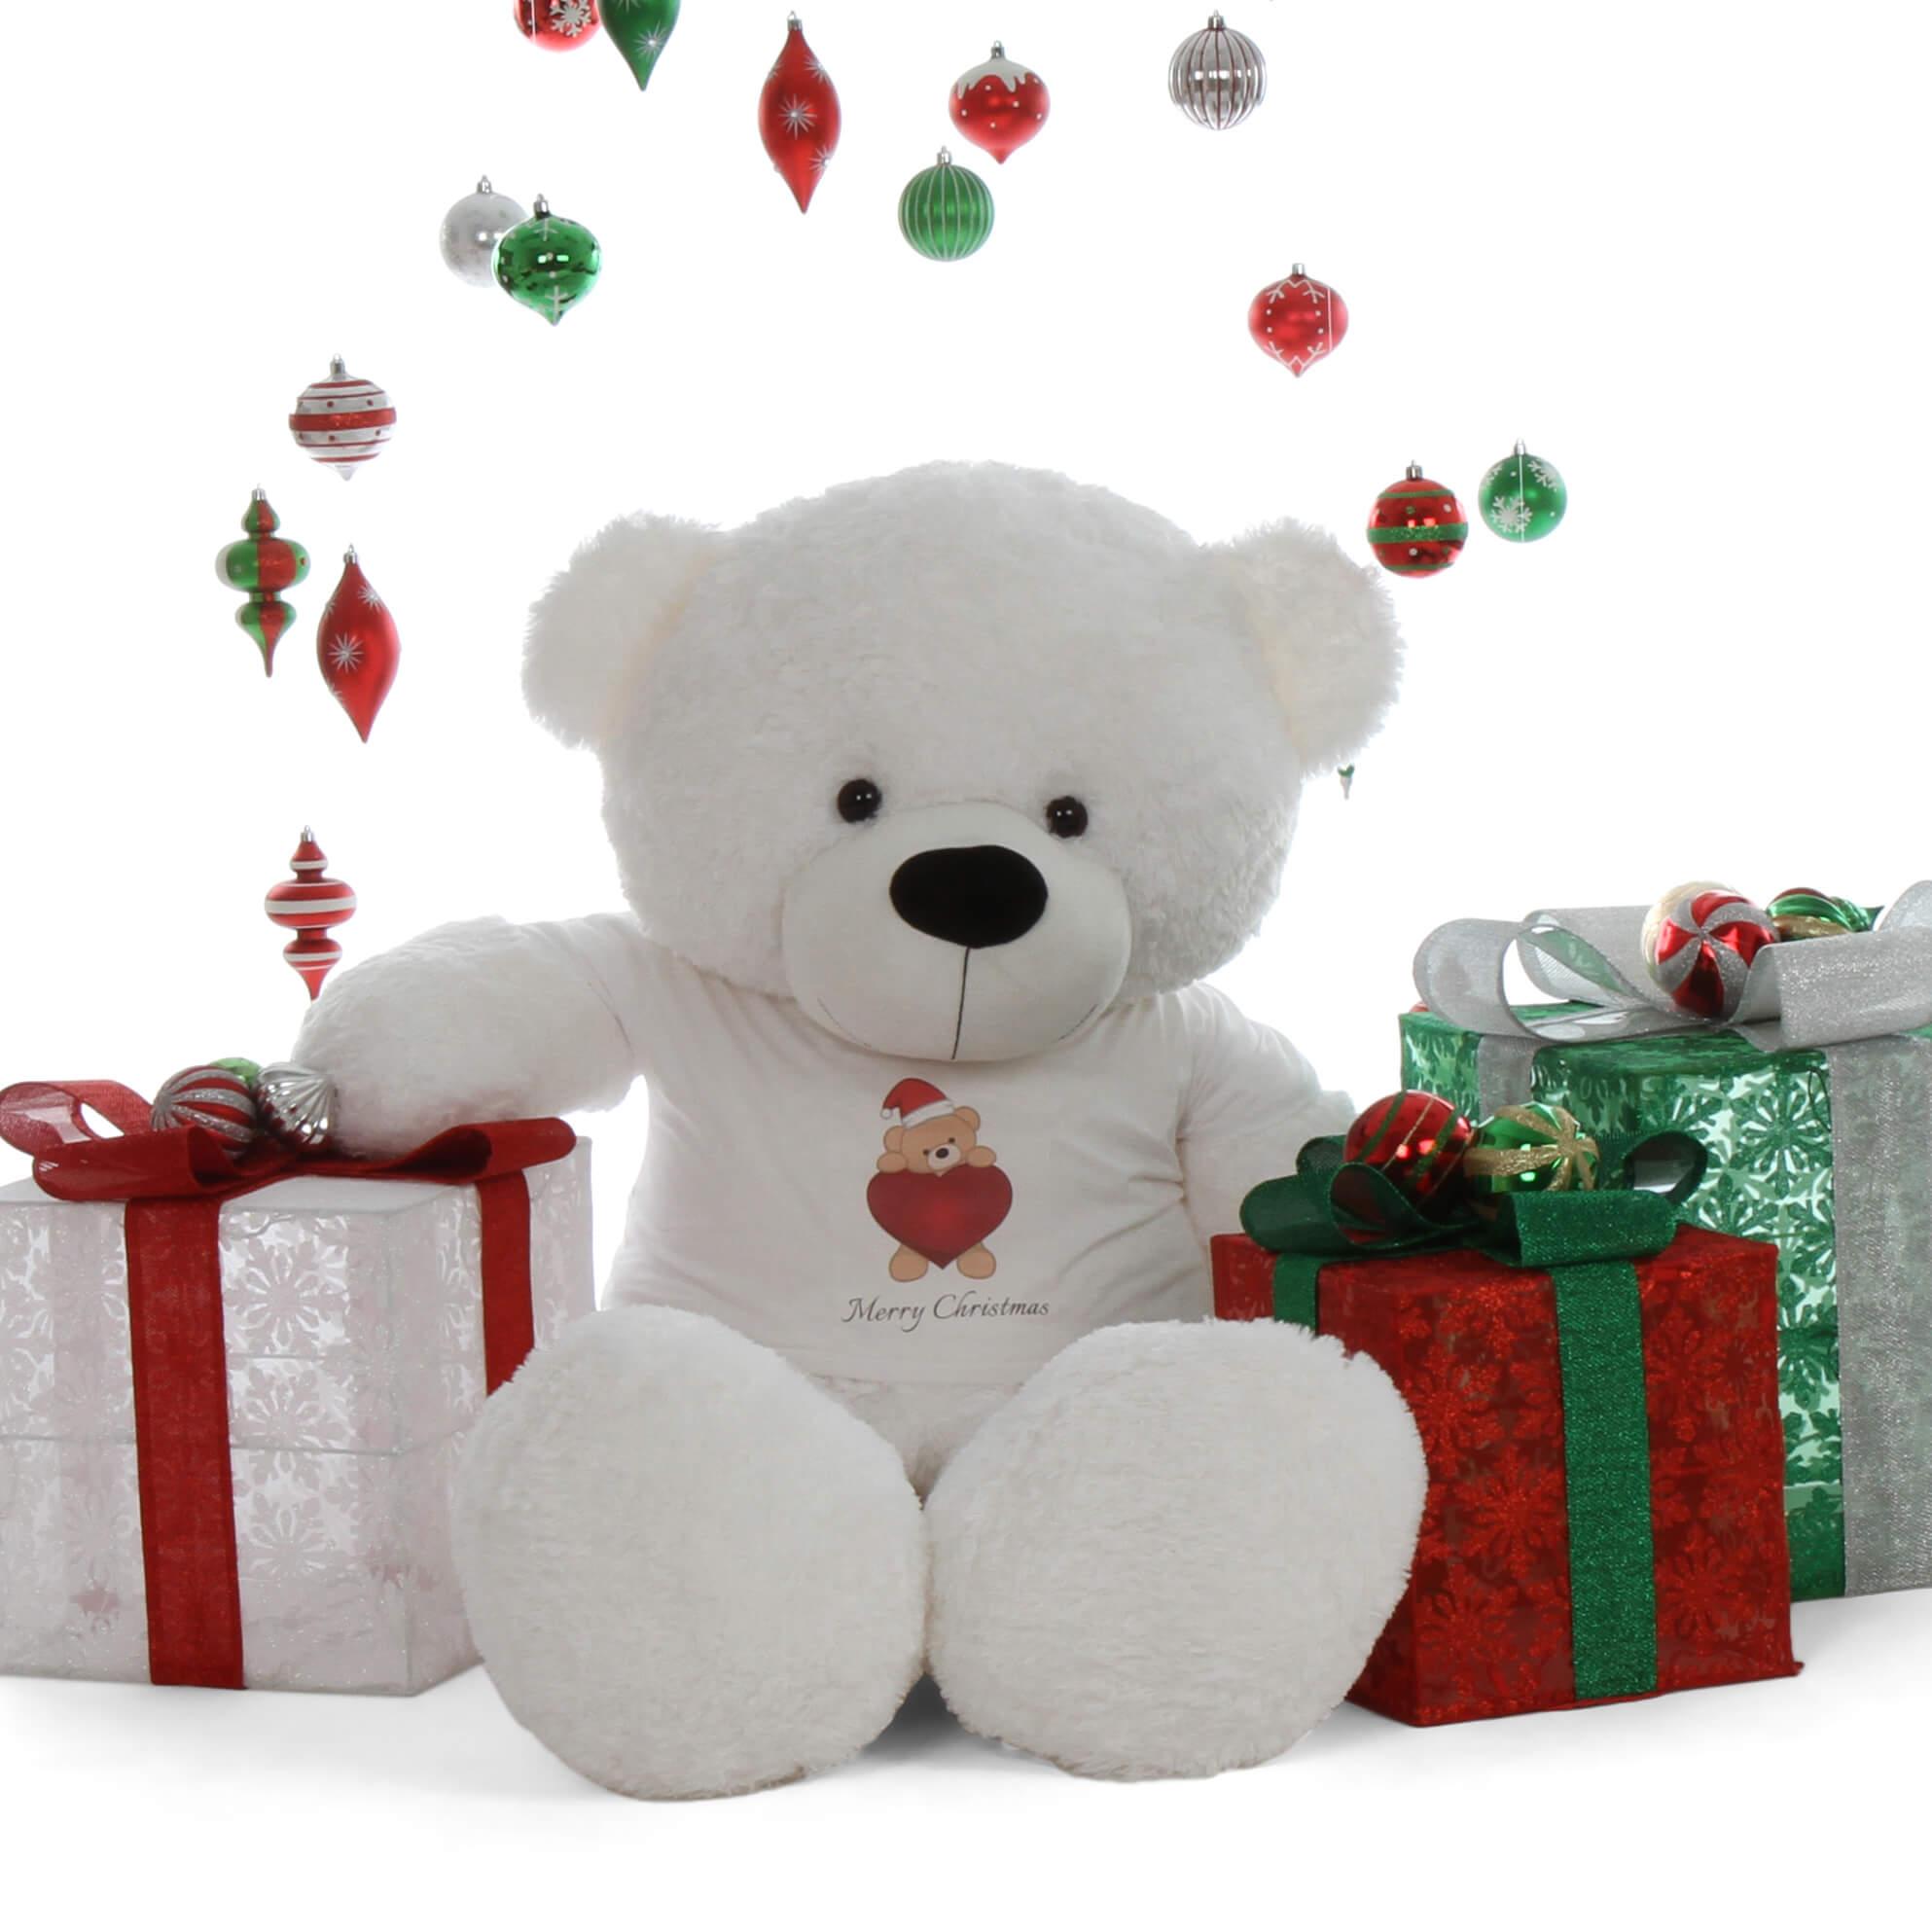 merry-christmas-5ft-life-size-white-teddy-bear-coco-cuddles-1.jpg